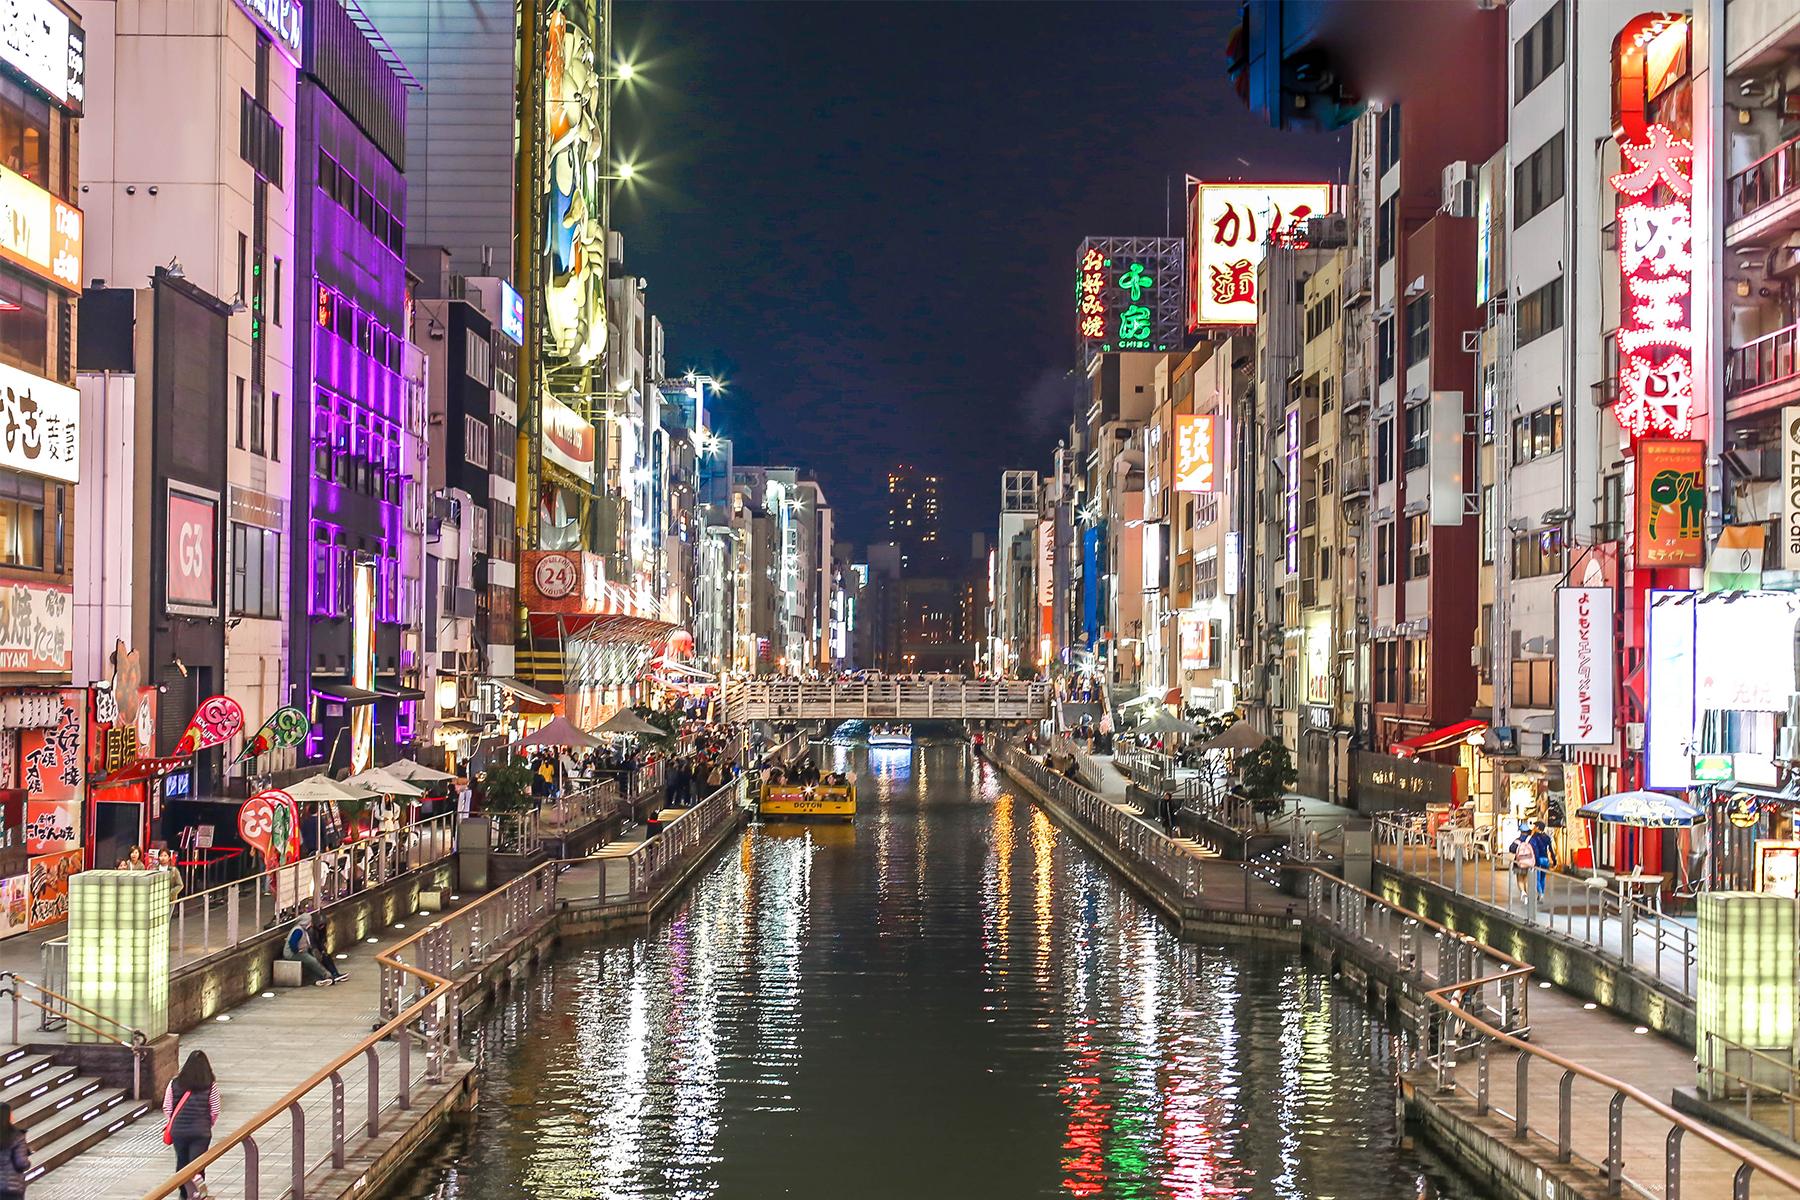 japan travel diary – haute khuuture blog